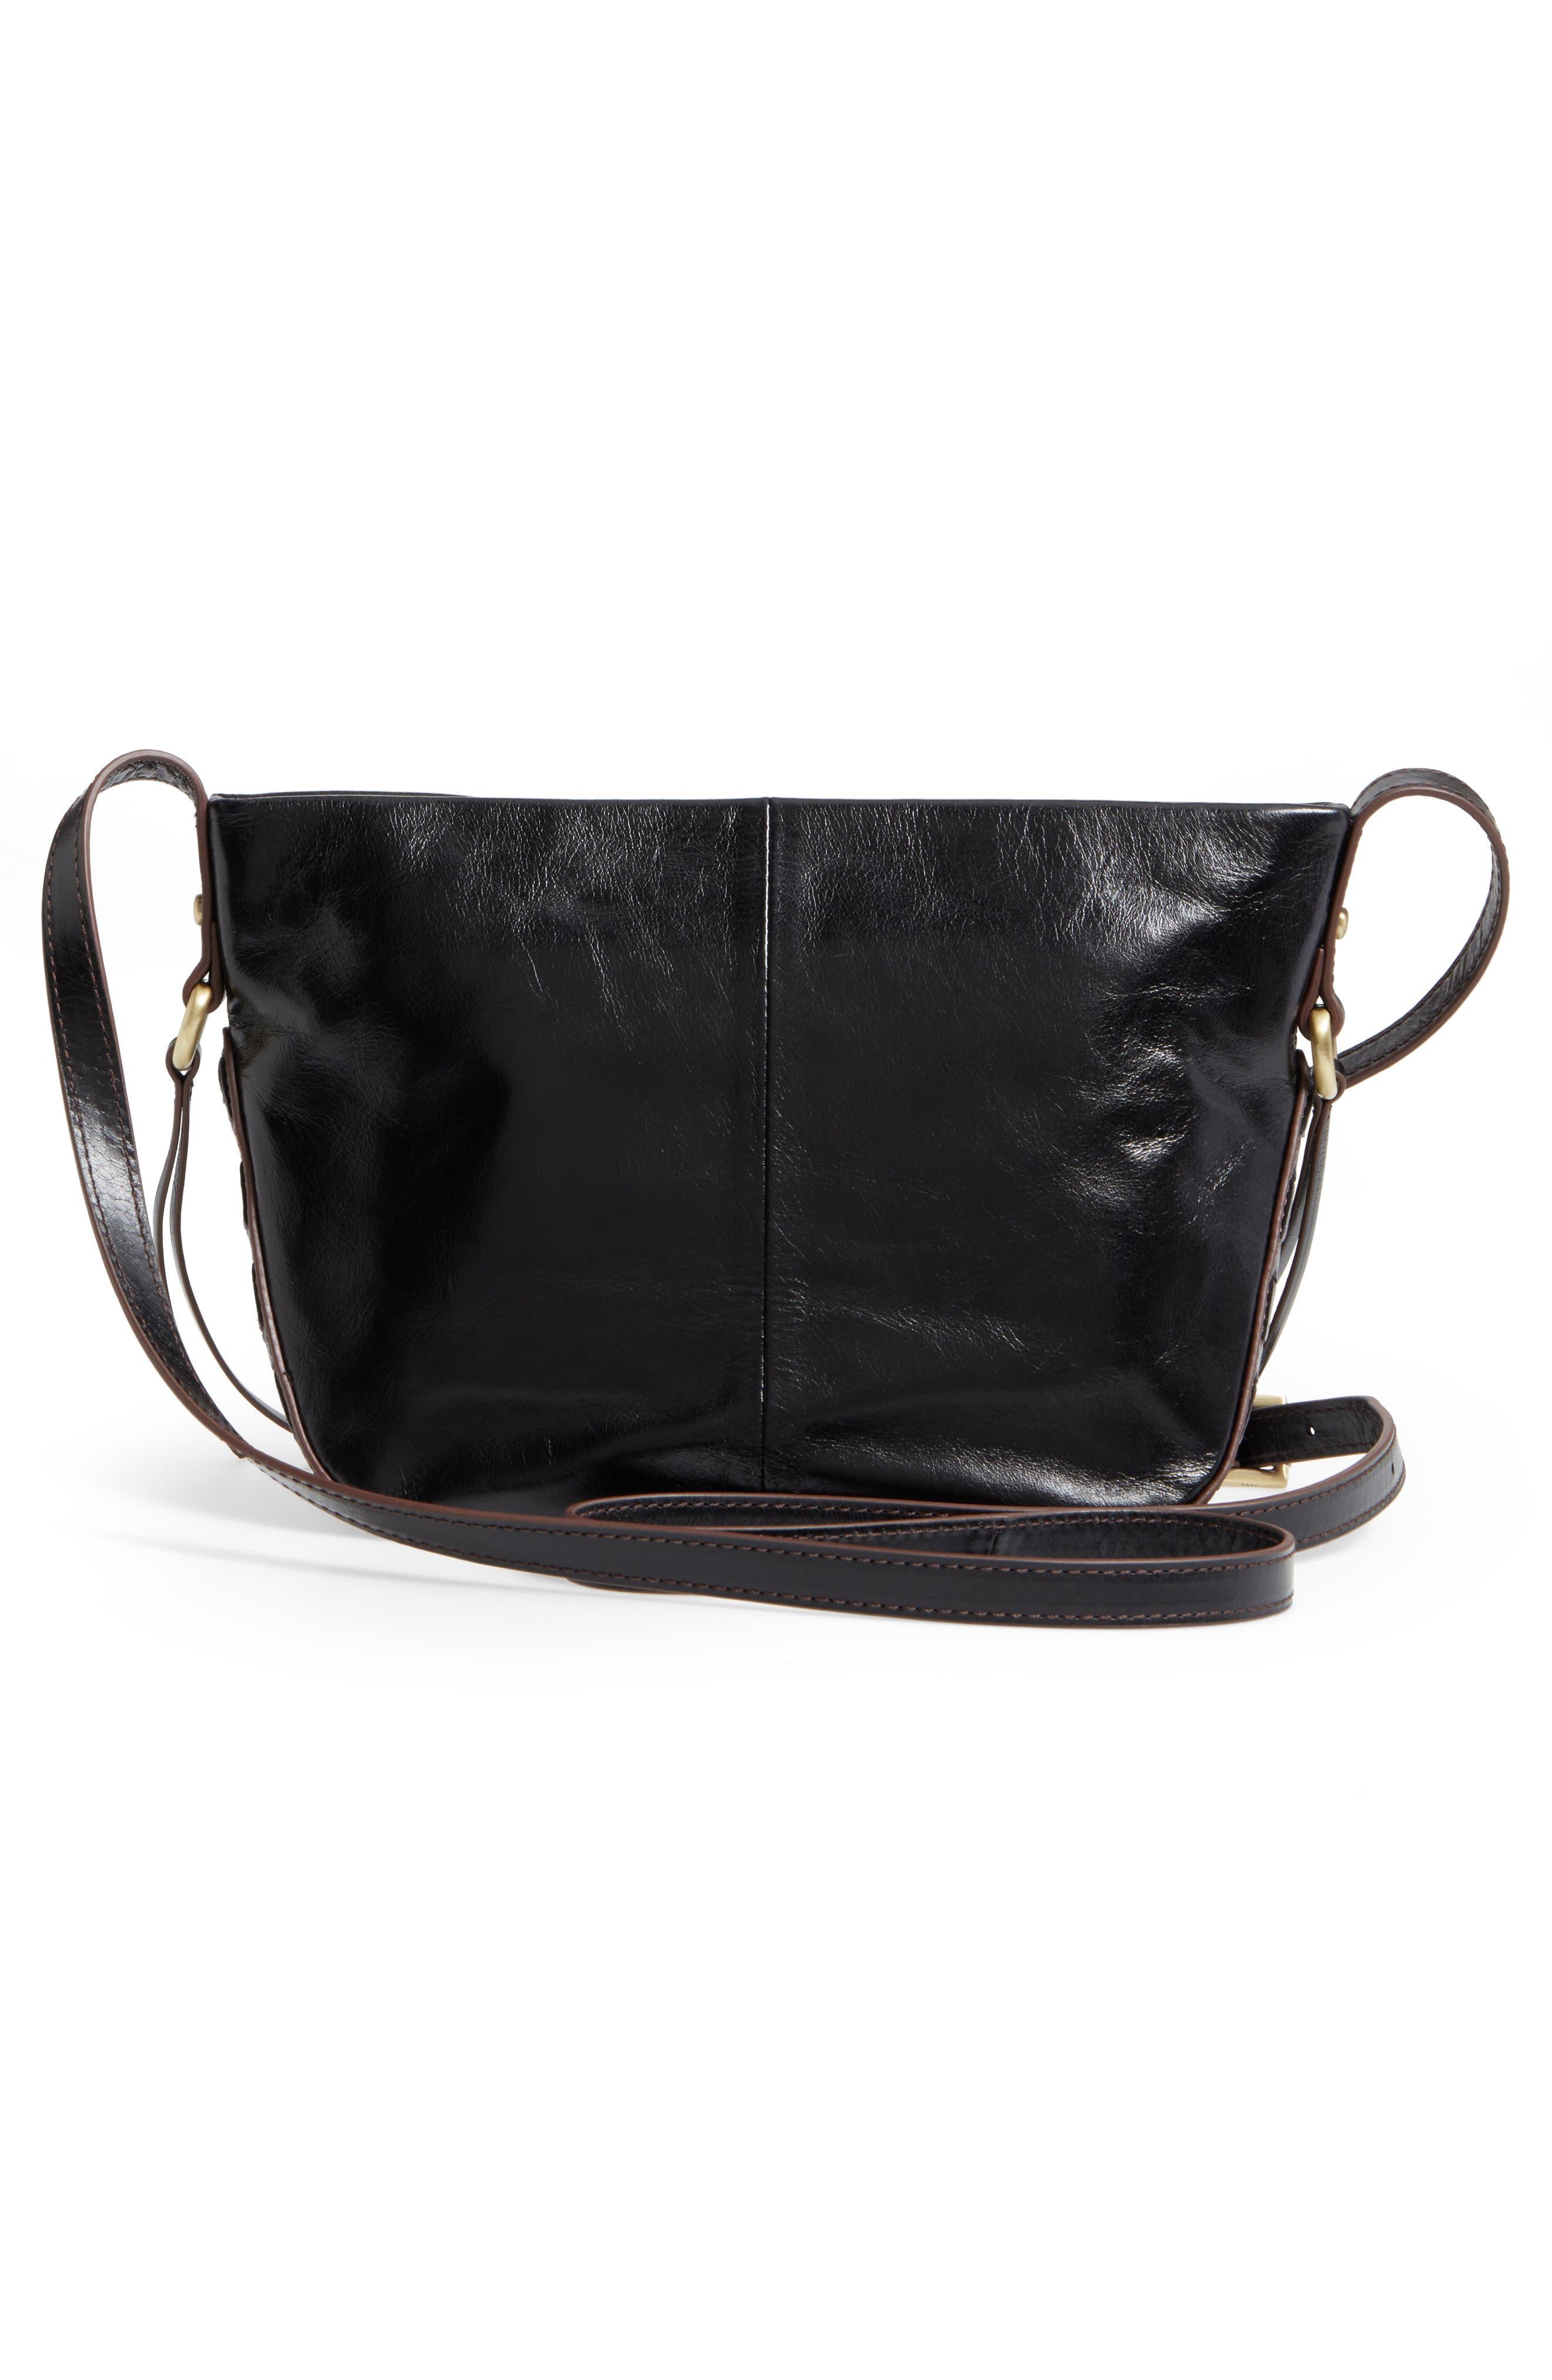 Muse Calfskin Leather Crossbody Bag,                             Alternate thumbnail 3, color,                             001